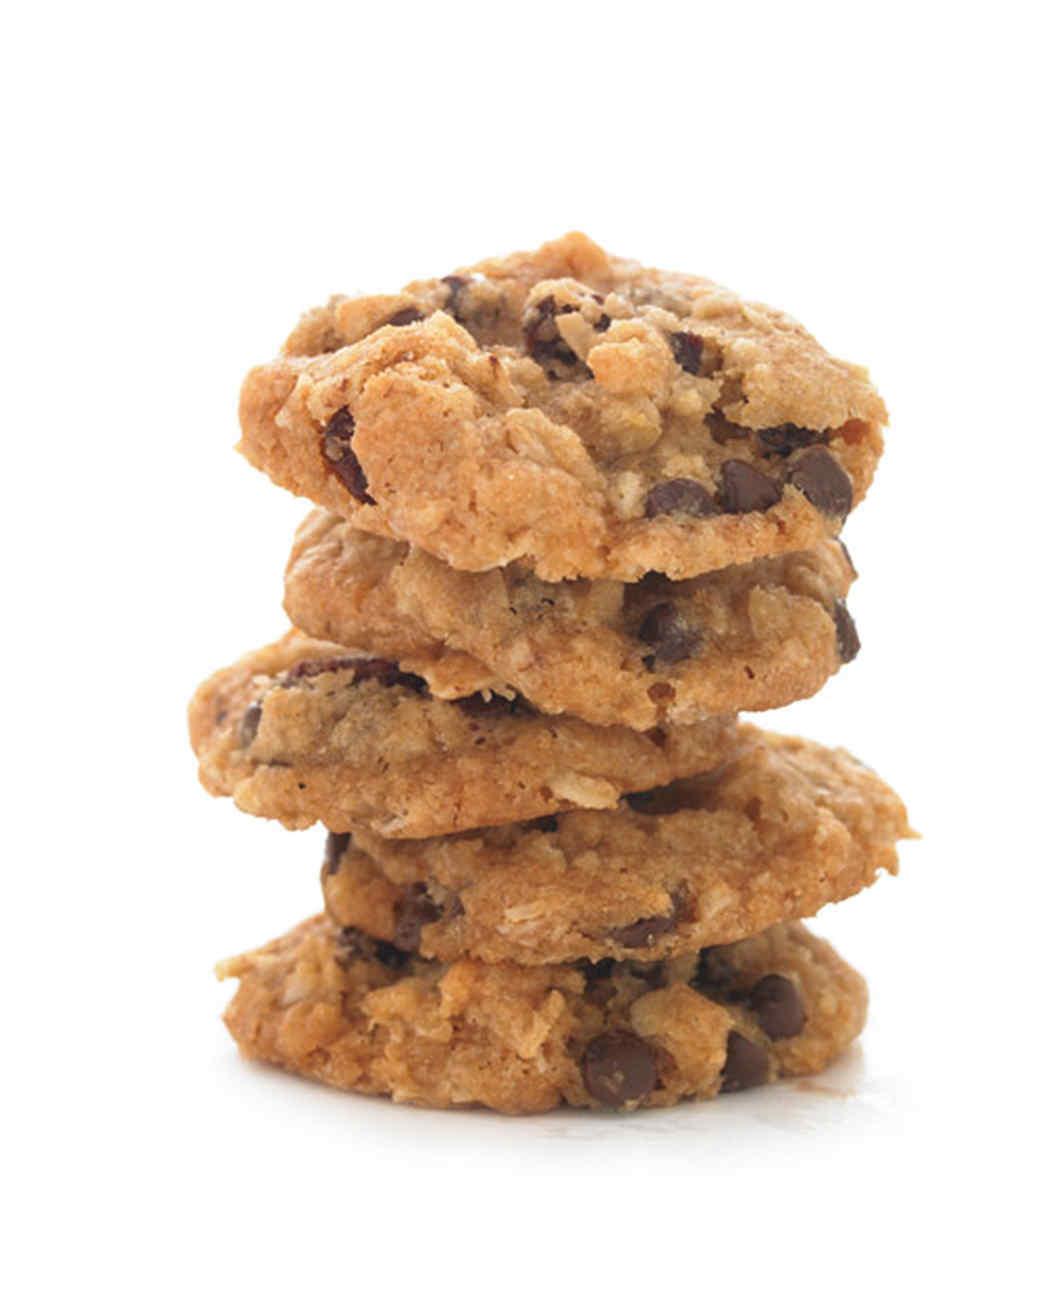 Vegan Oatmeal-Raisin Chocolate Chip Cookie